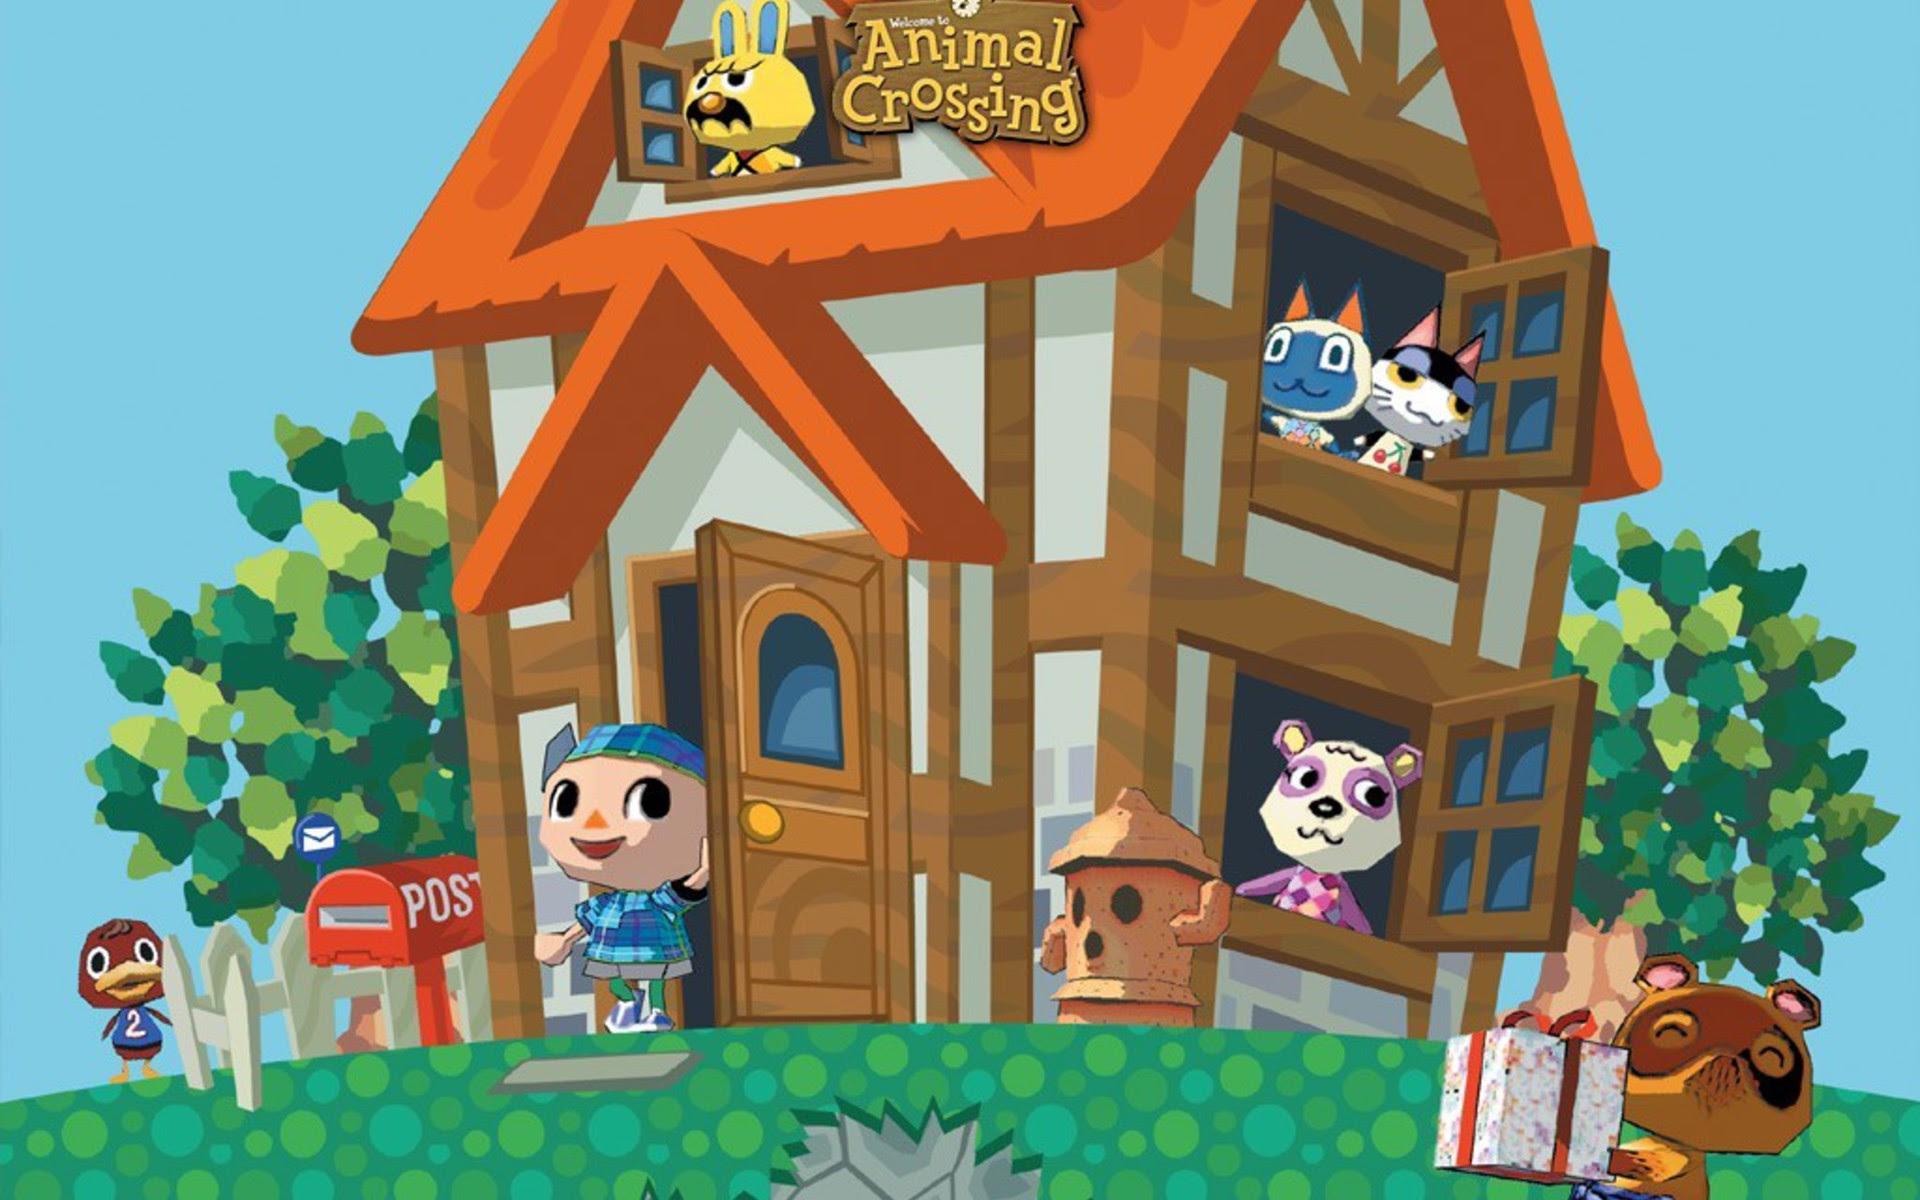 Animal Crossing New Leaf Animal Crossing New Leaf Wallpaper